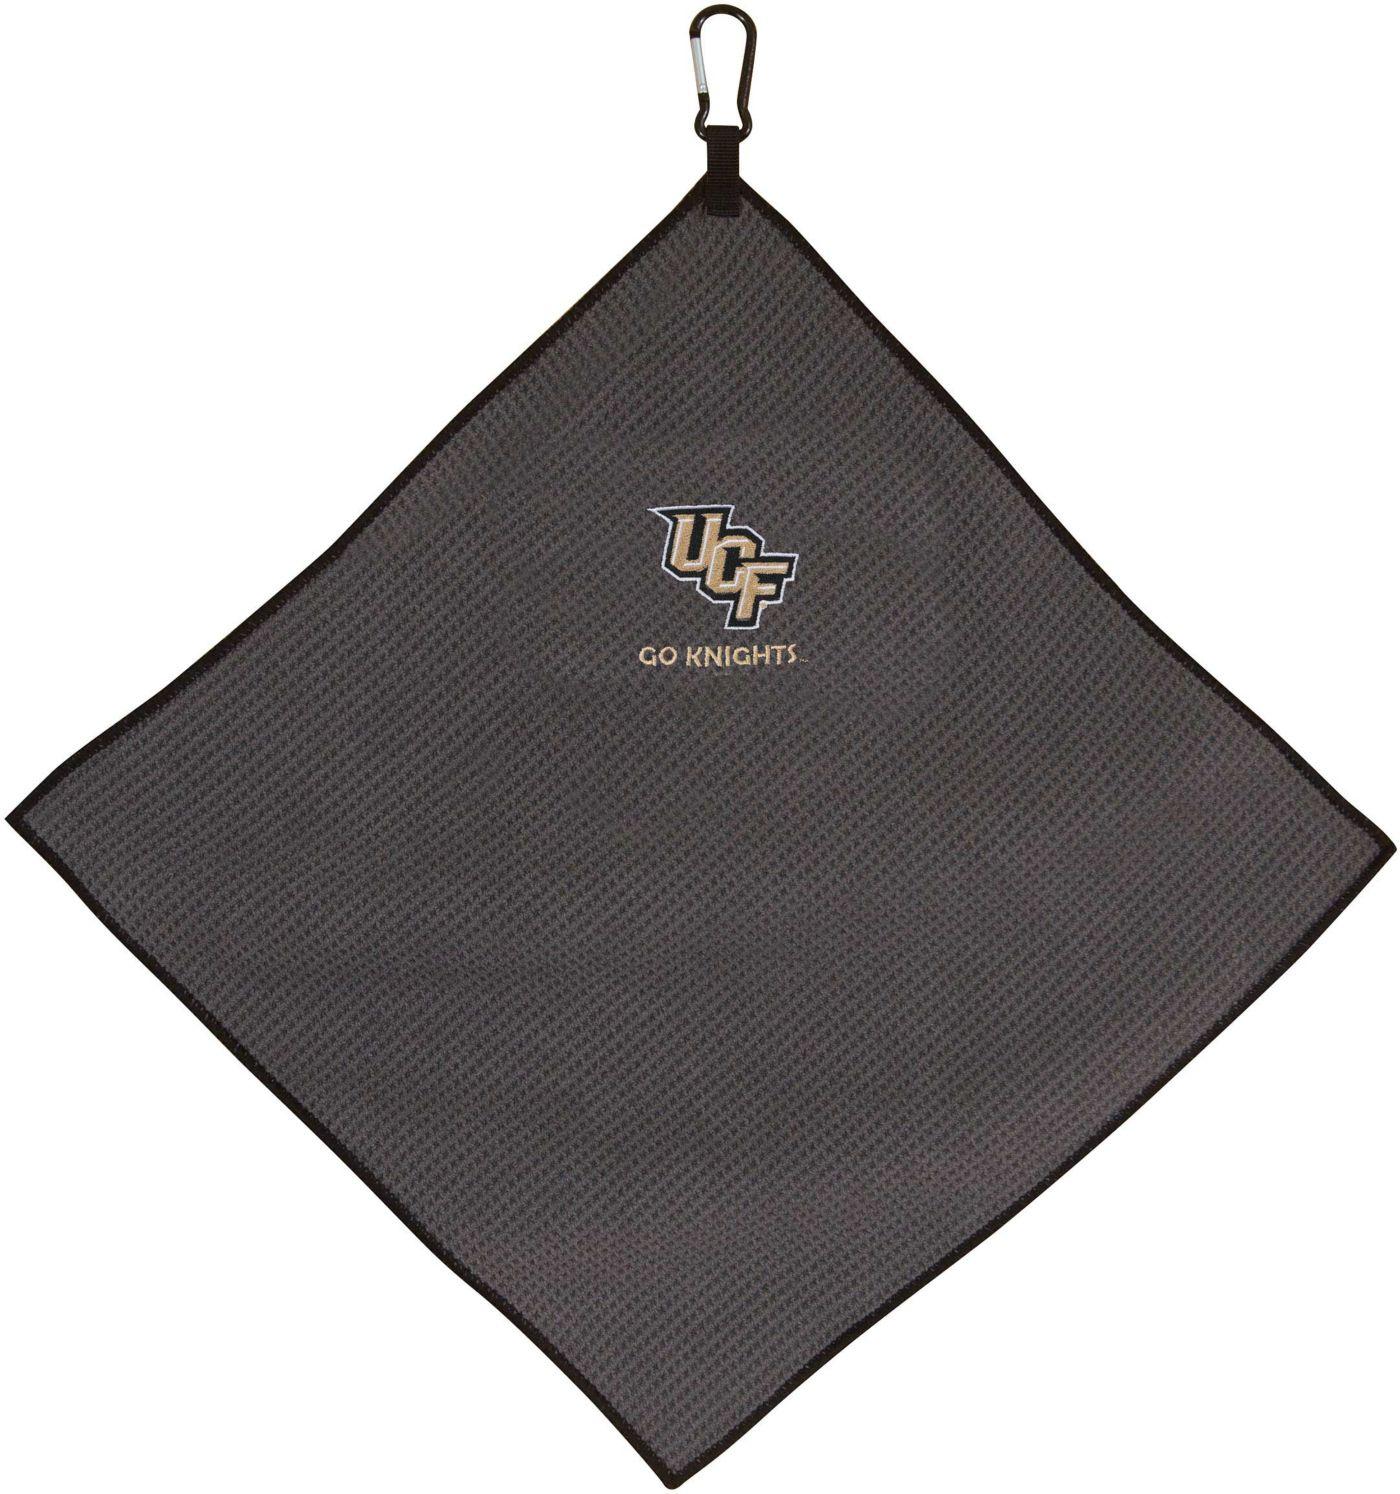 "Team Effort UCF Knights 15"" x 15"" Microfiber Golf Towel"